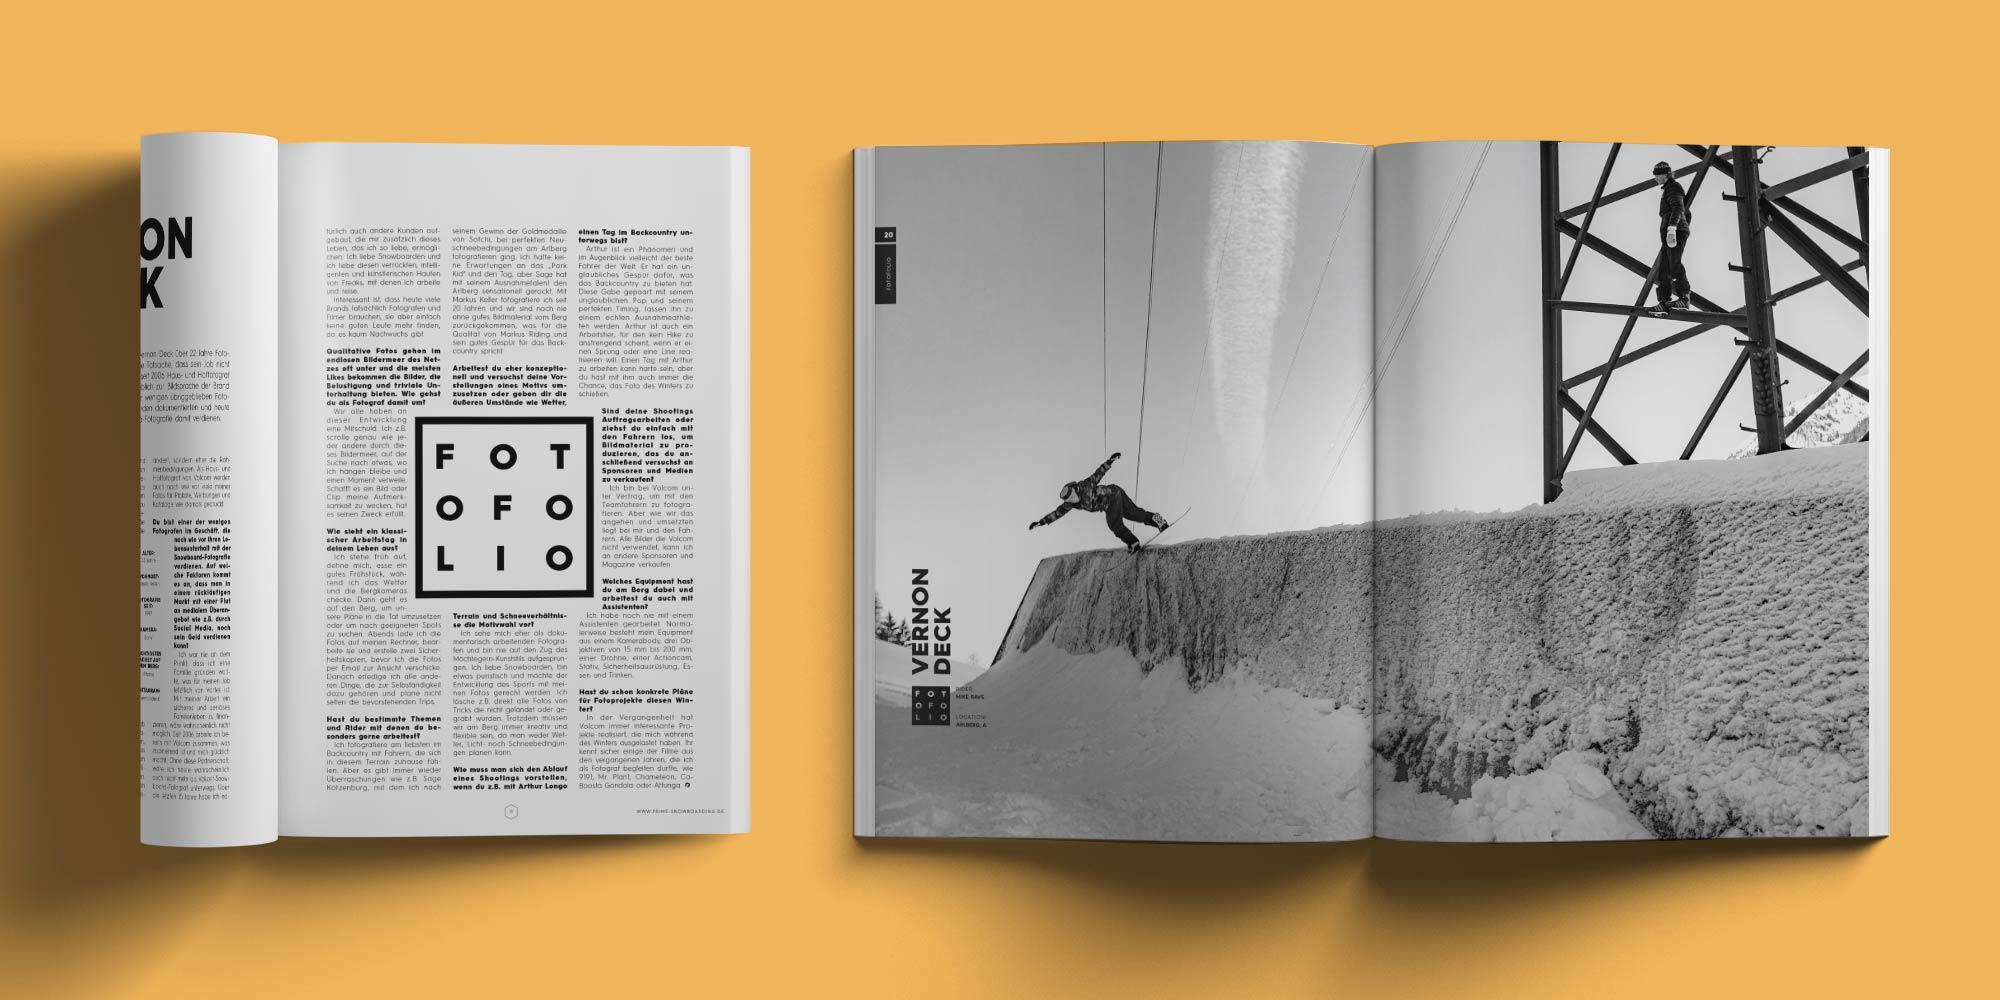 PRIME Snowboarding Printausgabe 20 - Vernon Deck Fotofolio